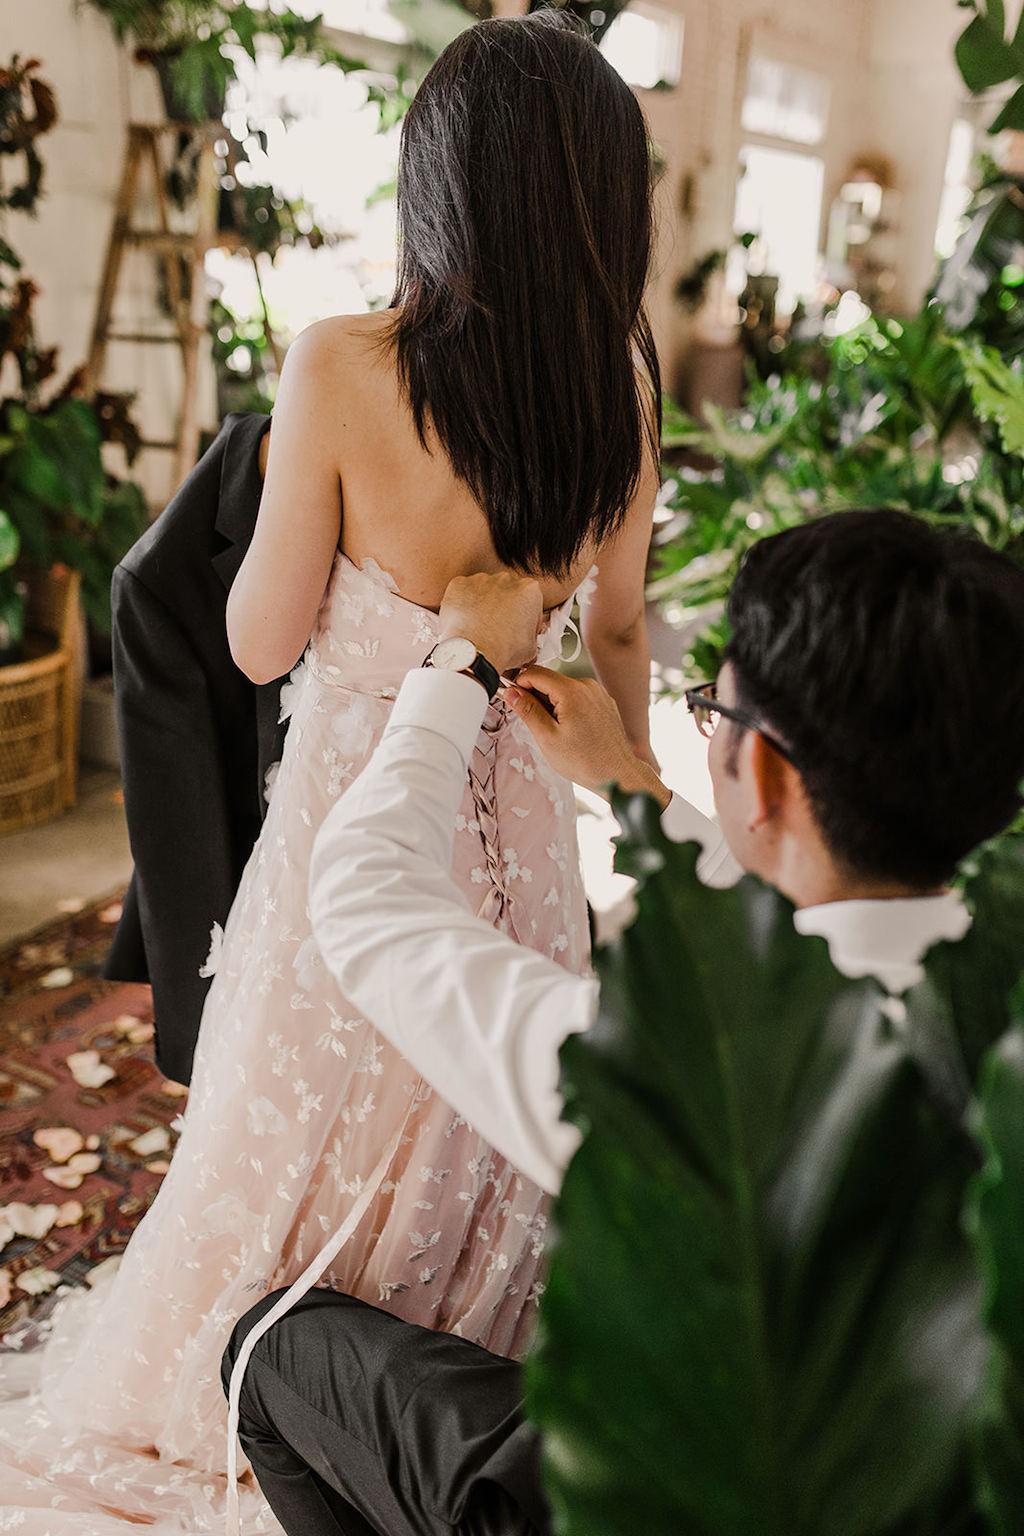 Bride Getting Ready Portrait in Strapless Peach Colored Wedding Dress | Intimate Tampa Wedding Venue Fancy Free Nursery